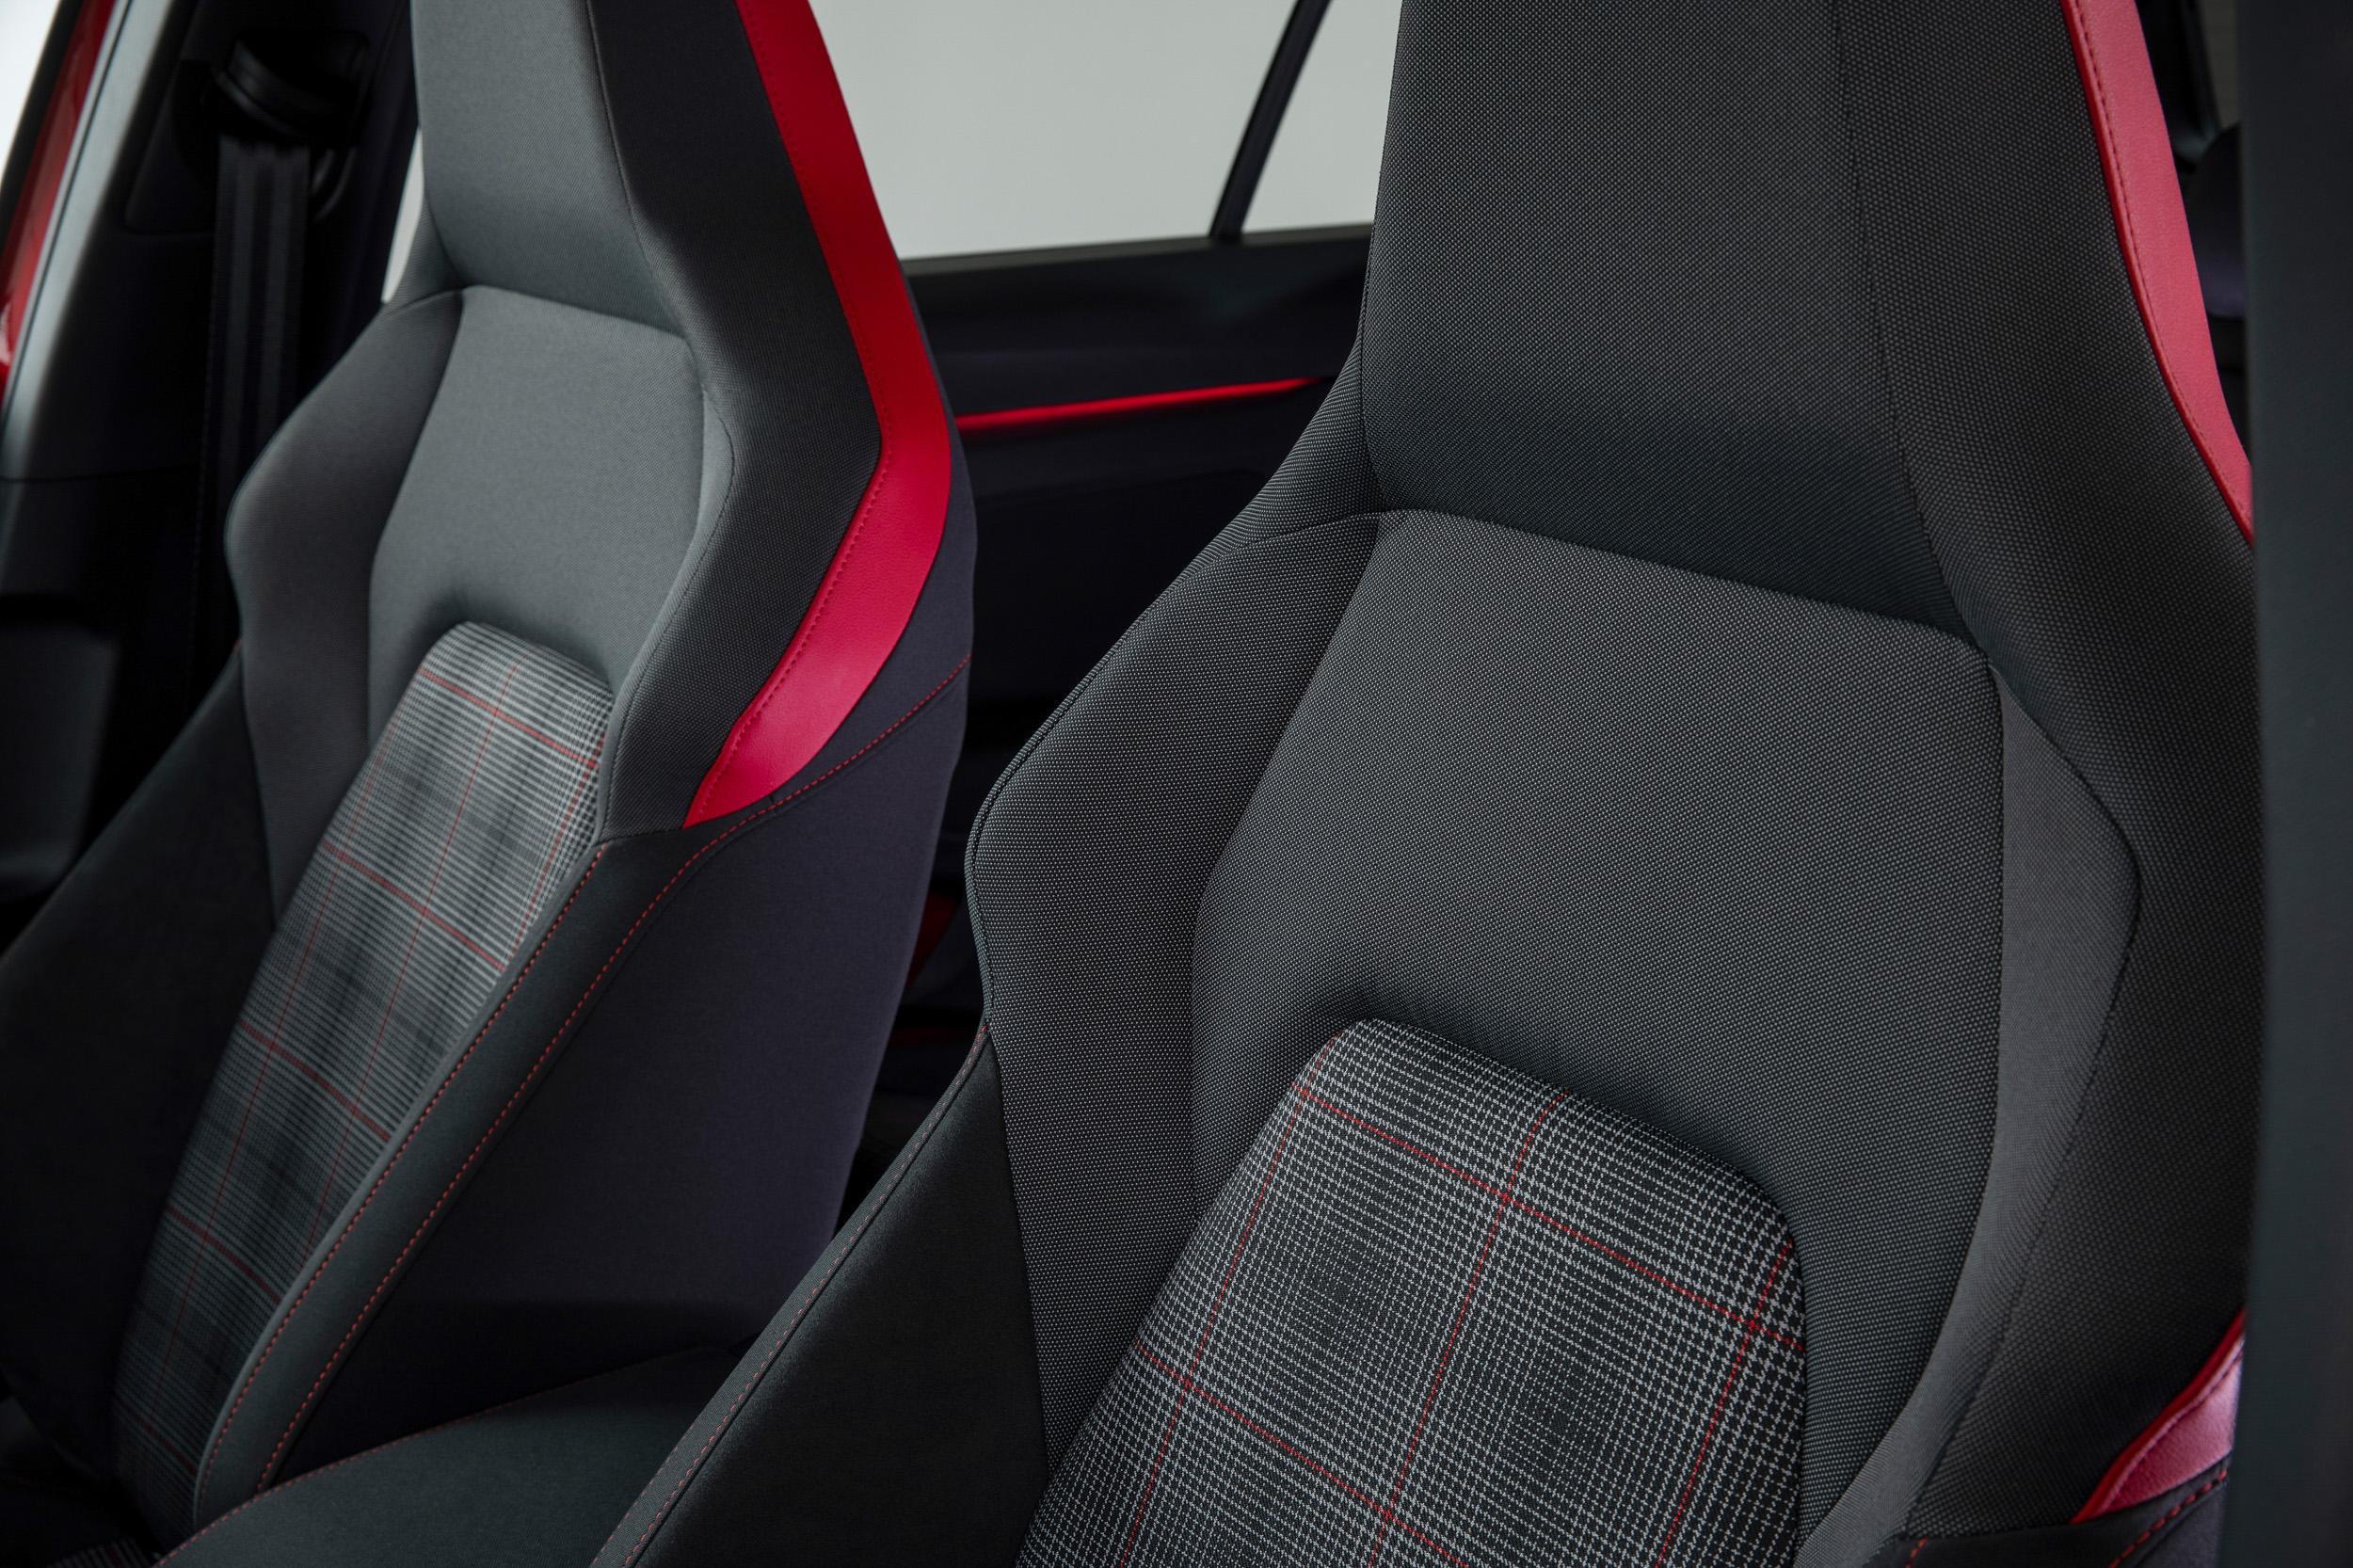 Golf 8 GTI首次導入Vienna真皮跑車型座椅附駕駛座電動調整、雙前座通風加熱等功能。